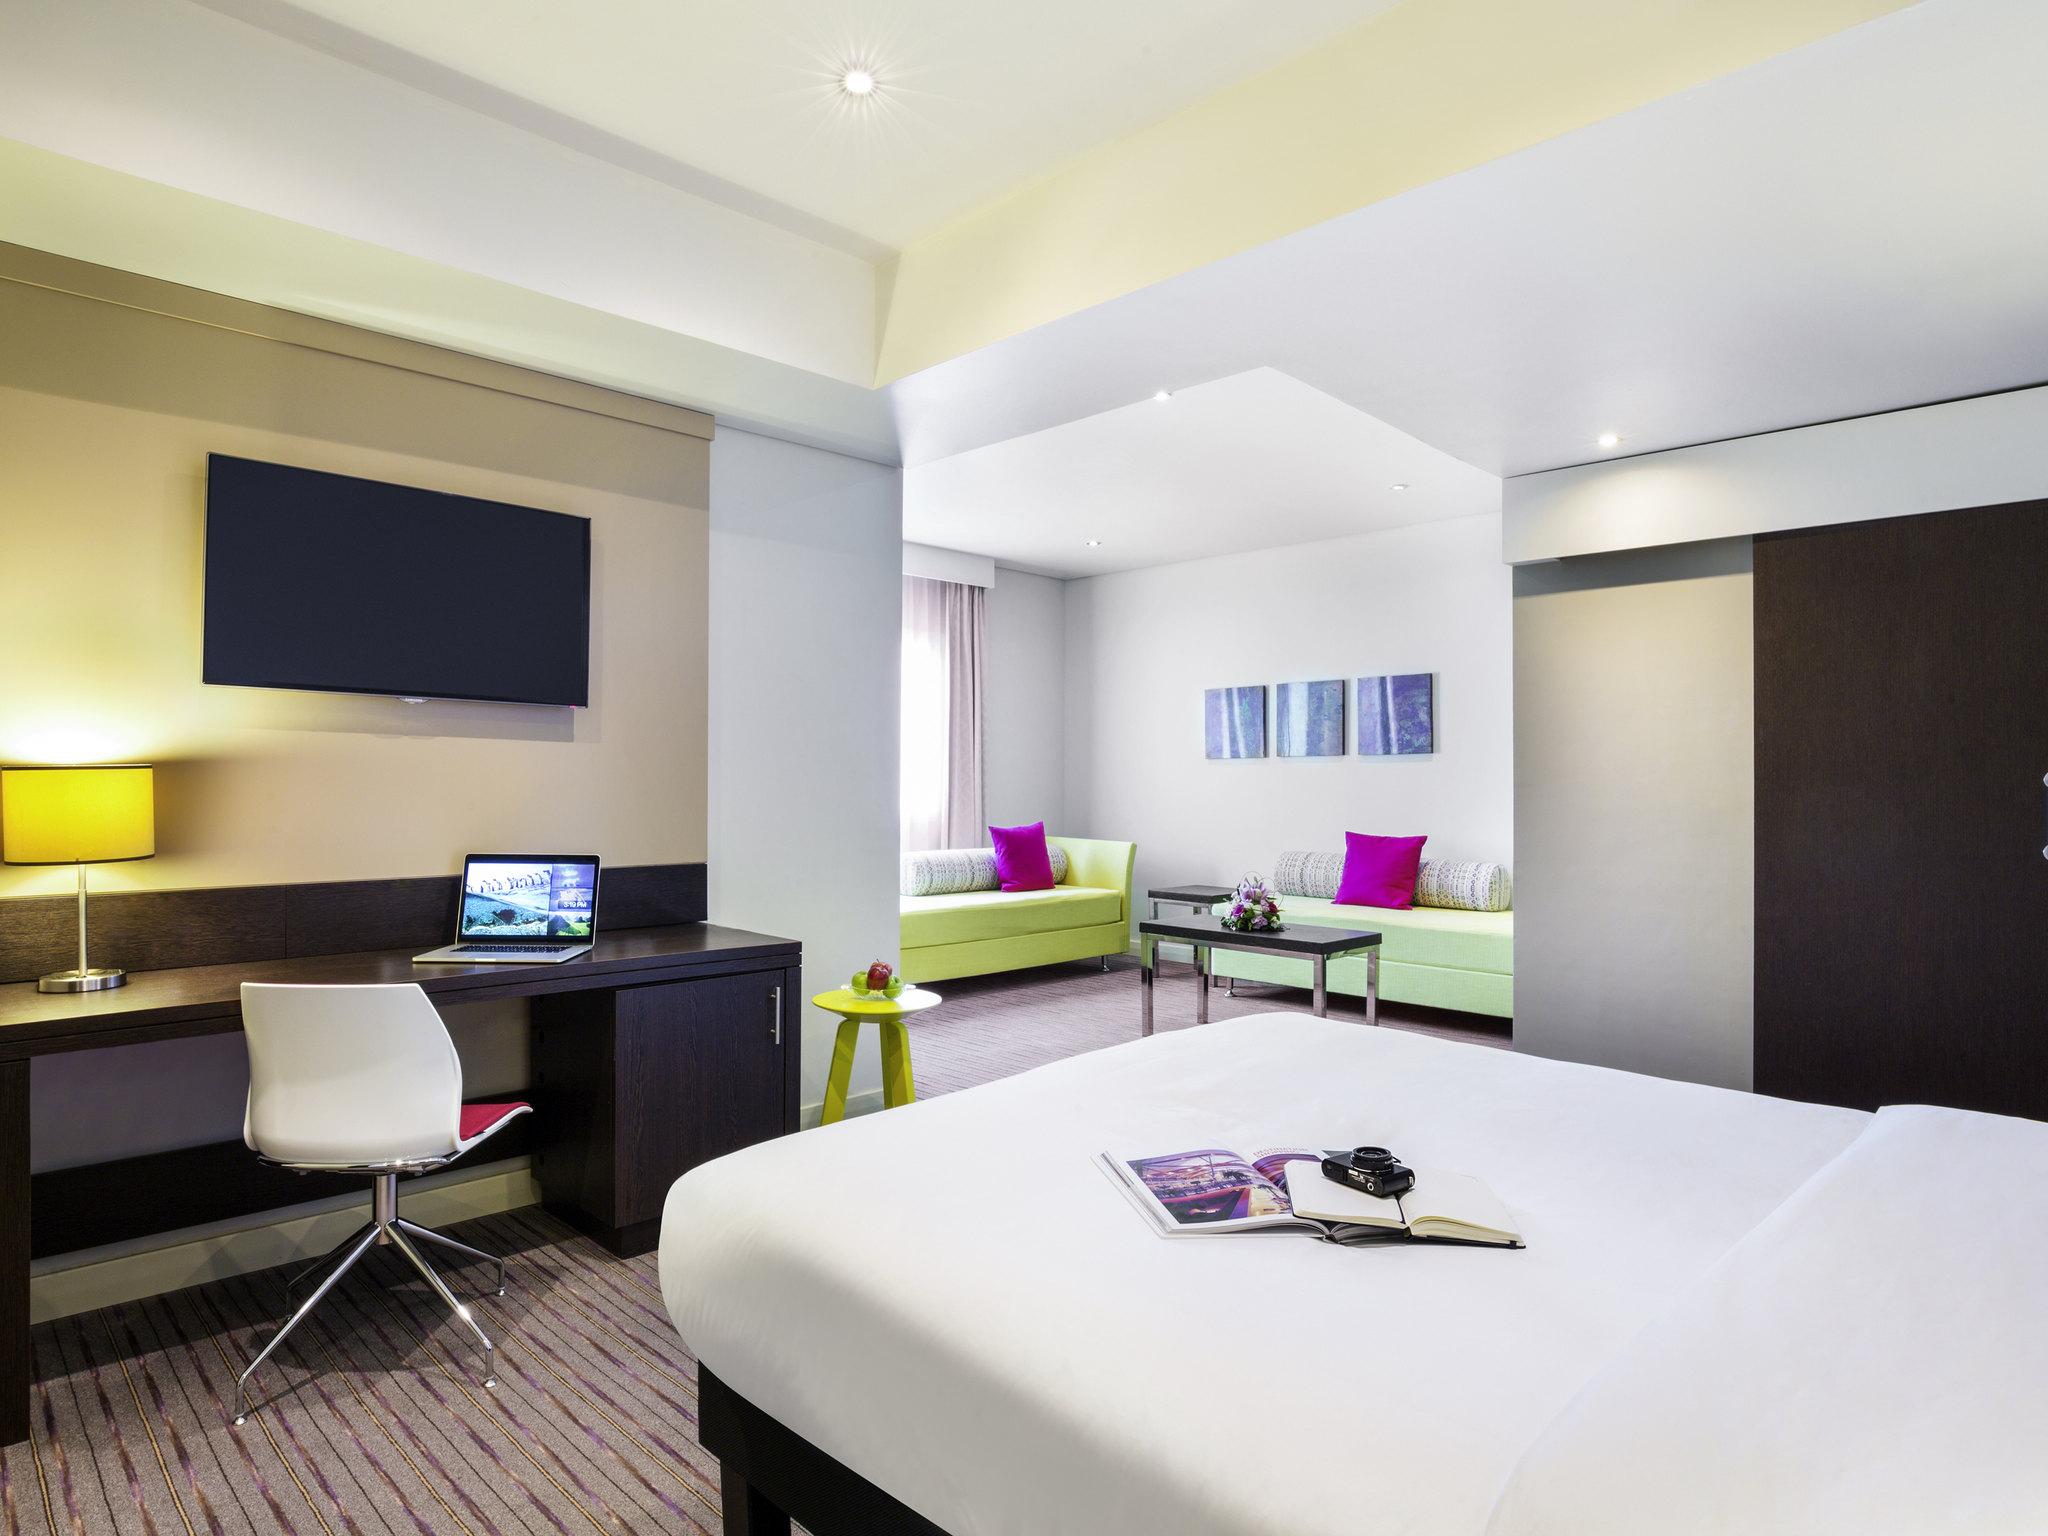 Hotel in SHARJAH - Al Majaz Hotel Sharjah - By AccorHotels